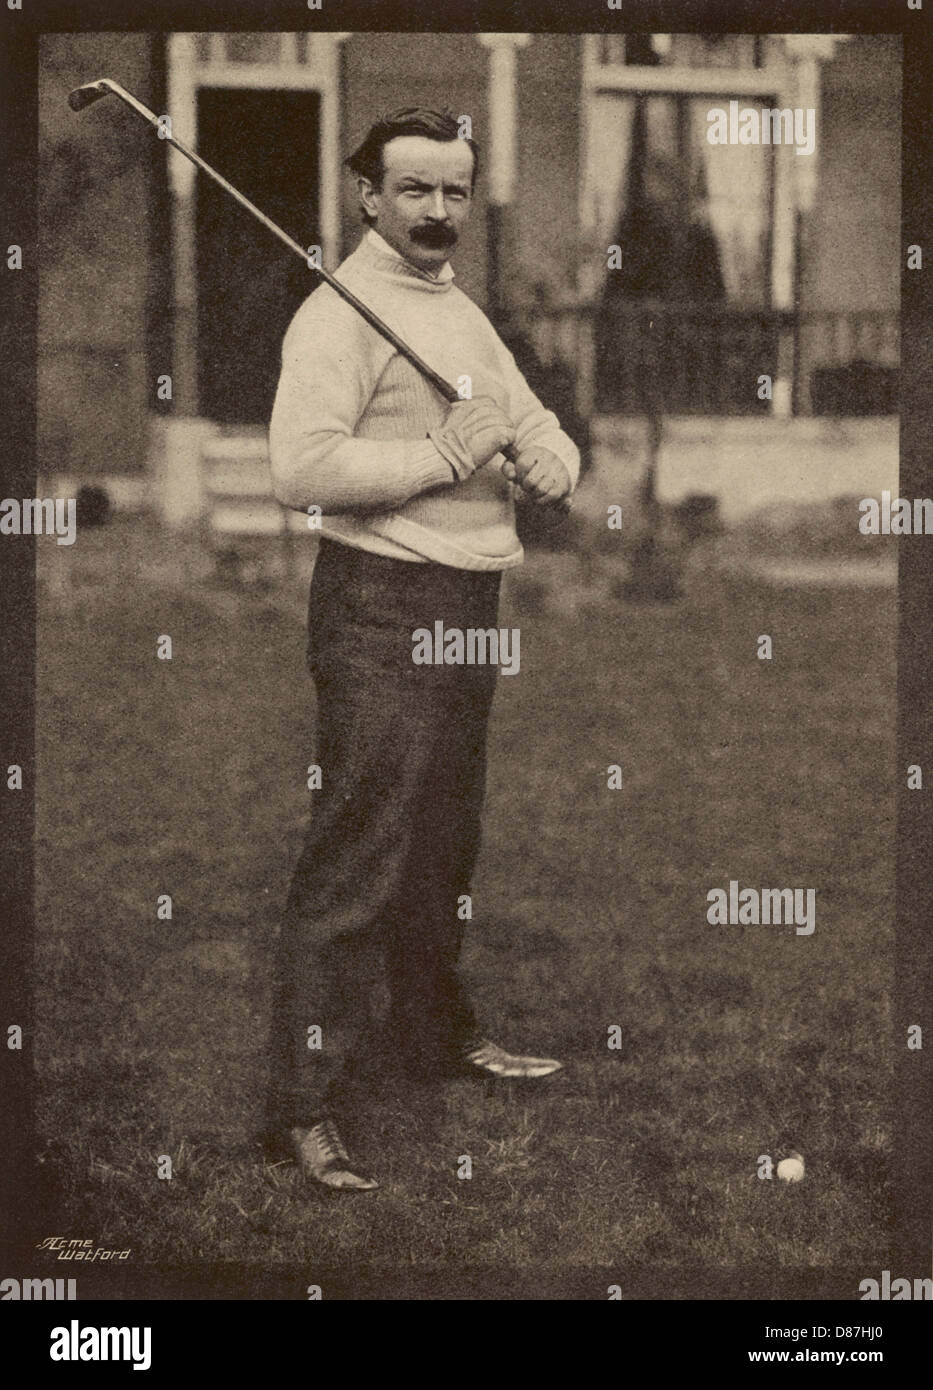 Lloyd George Golf Photo Stock